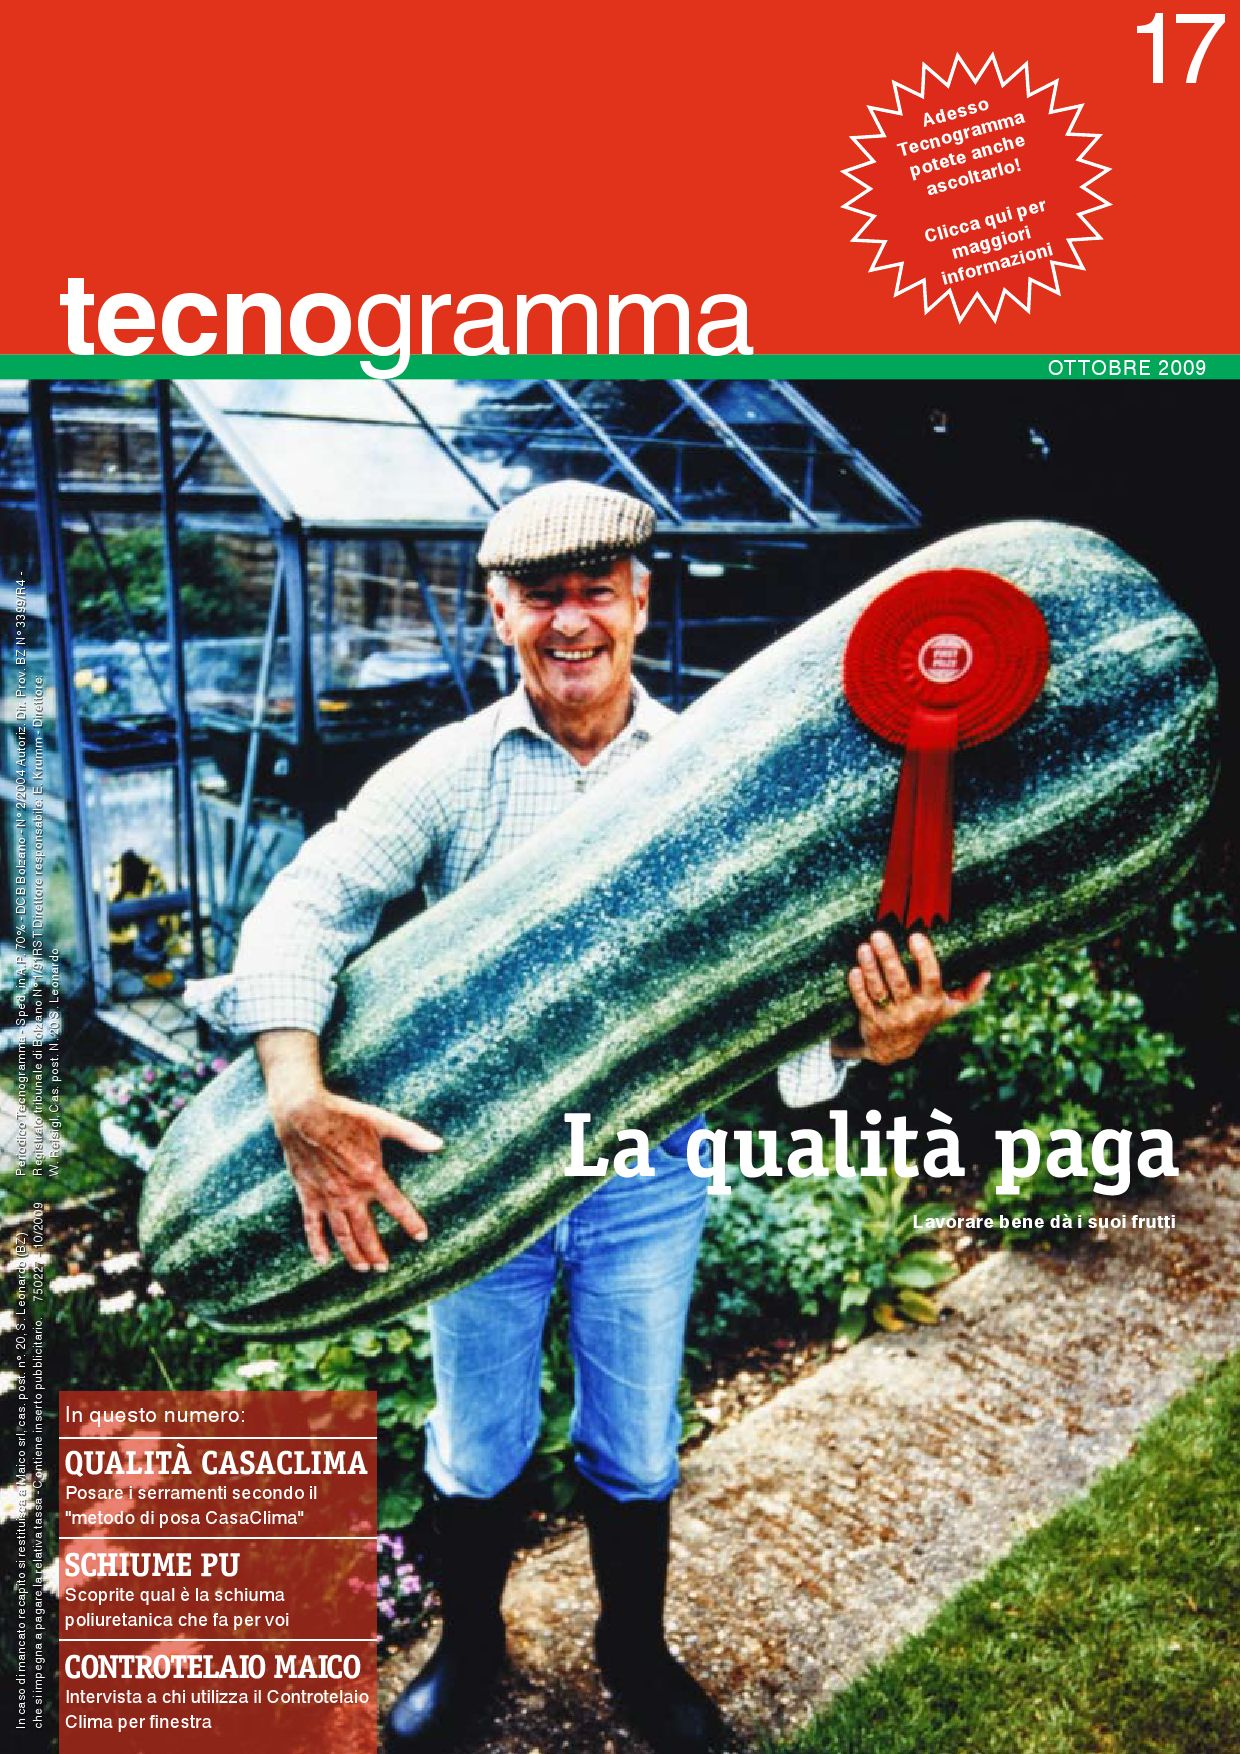 Tecnogramma 17 la qualit paga by maico italia issuu for Finestra qualita casaclima